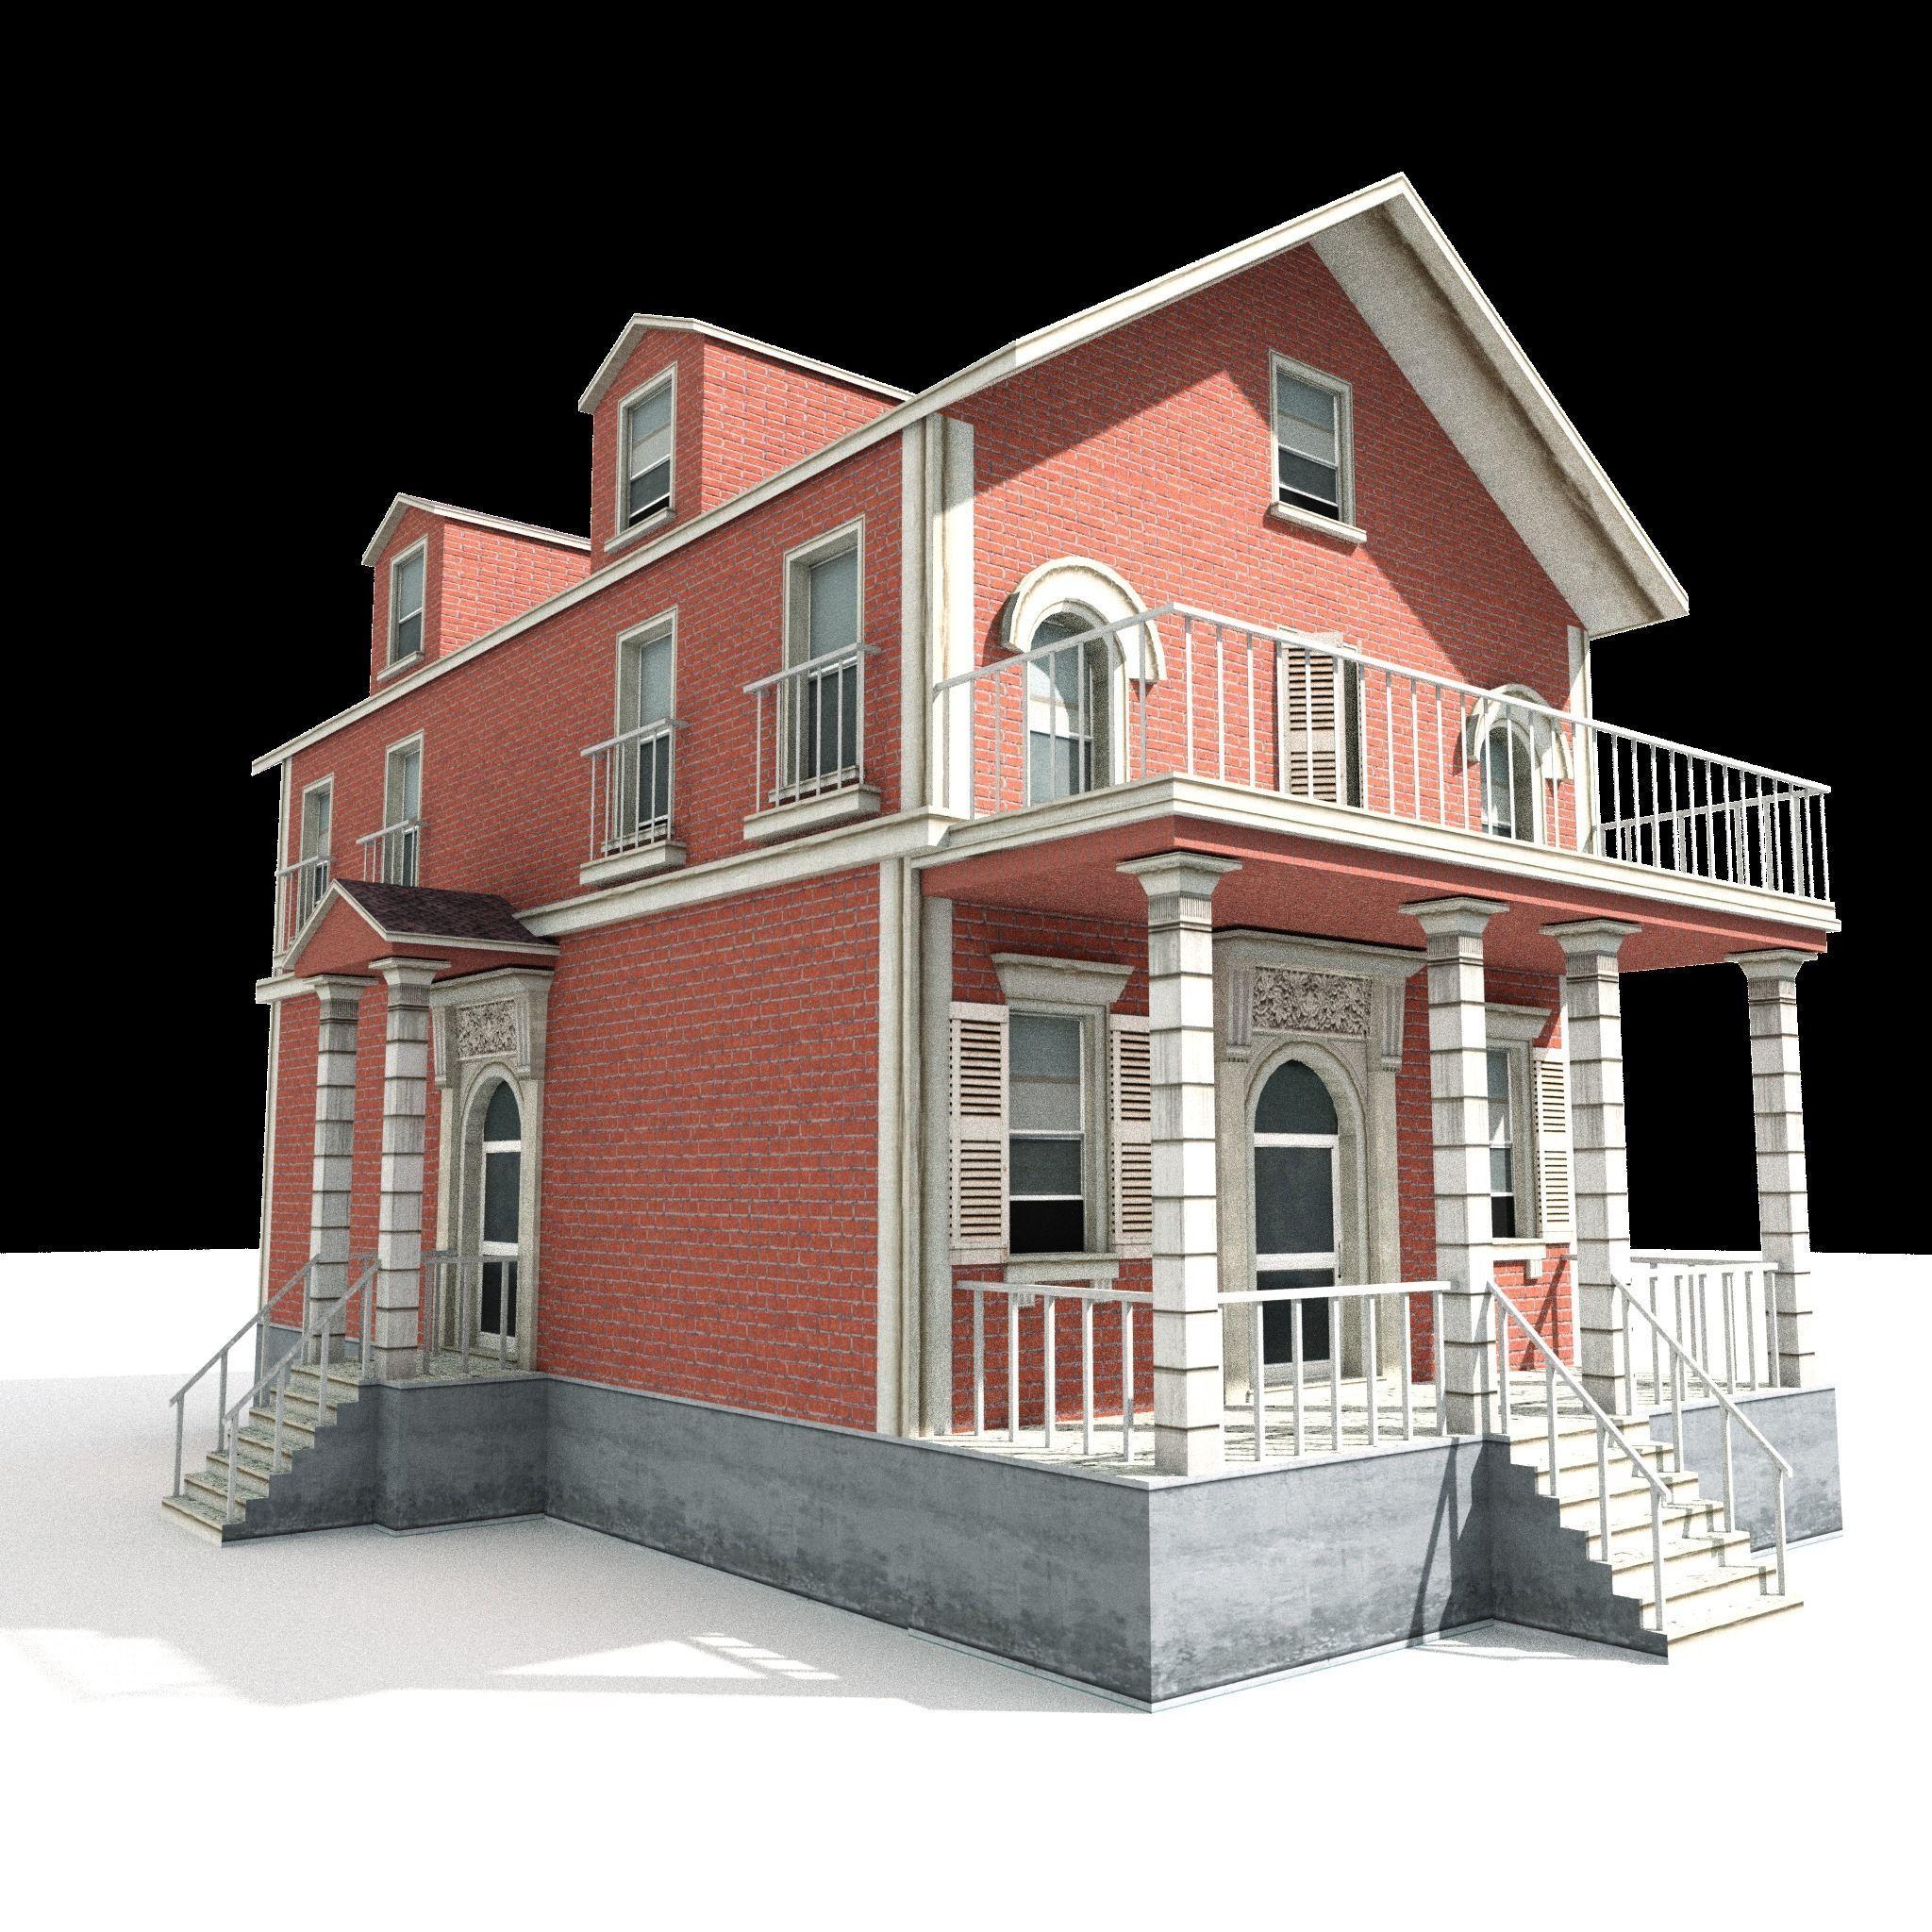 Residential house 01